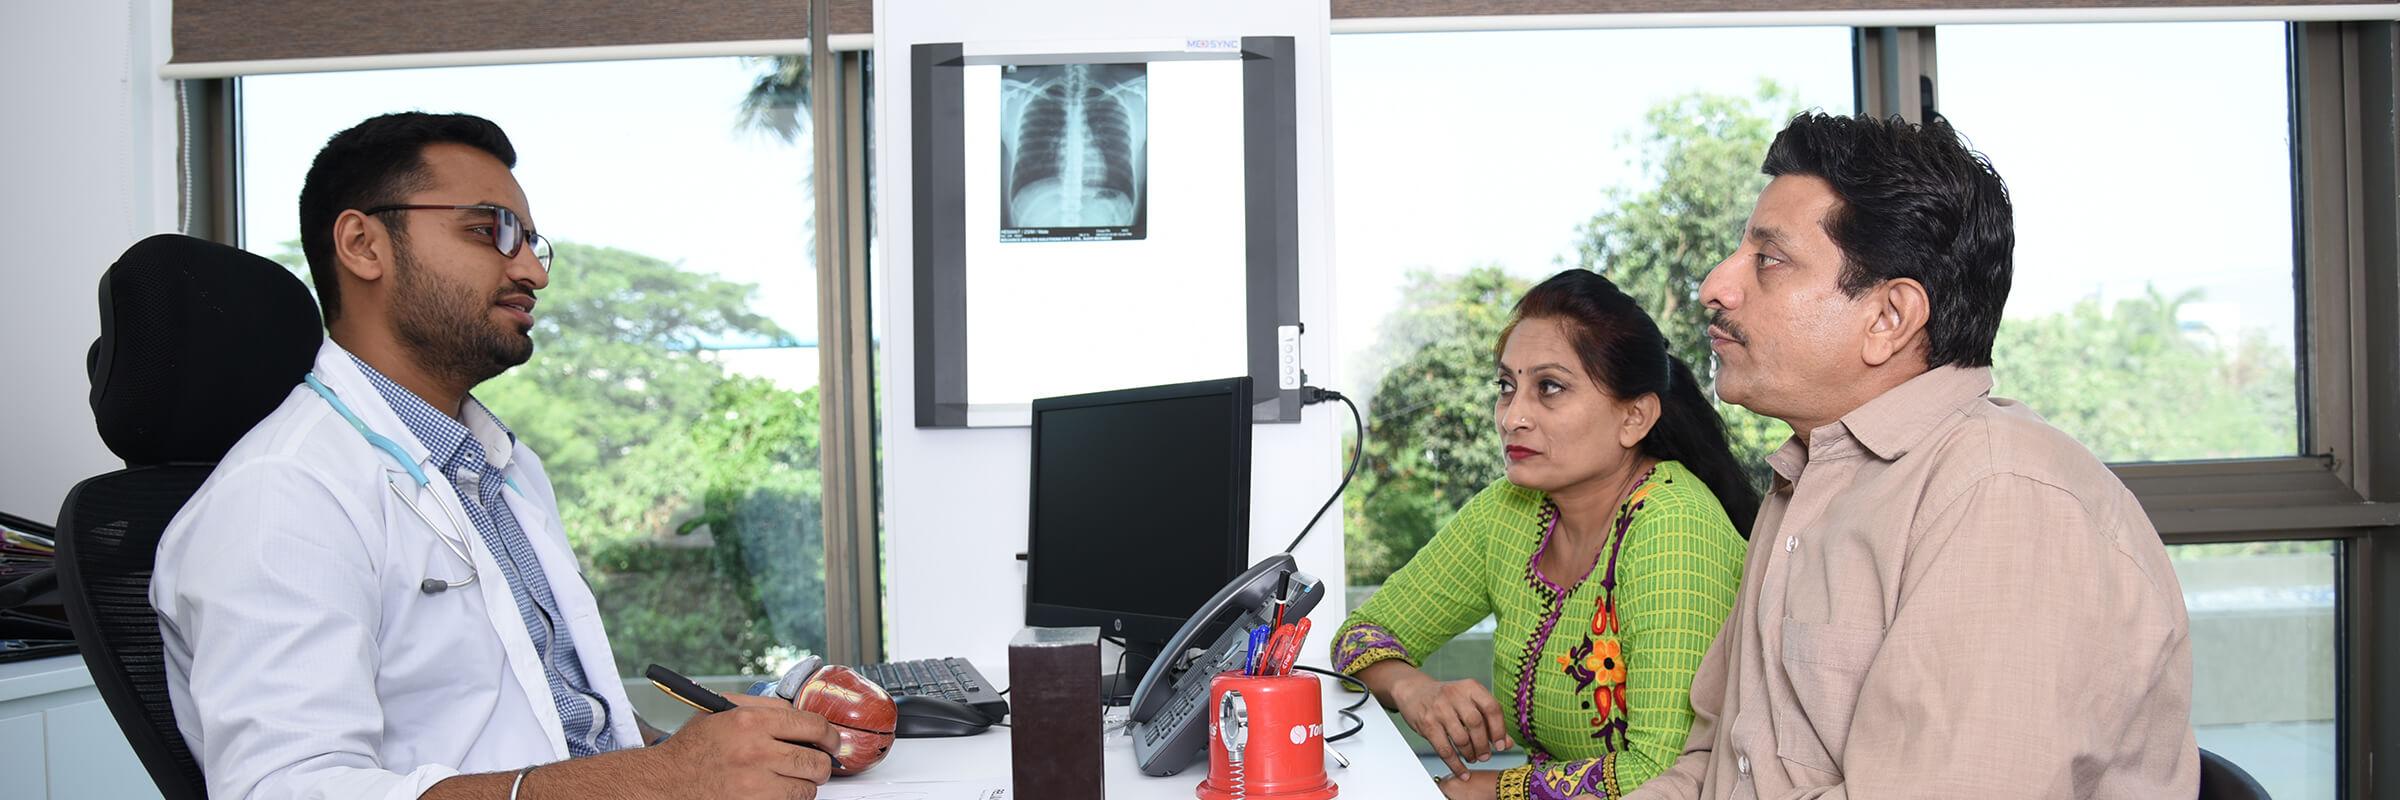 Best Neurologists in India | Top Neurosurgeon in Navi Mumbai, India